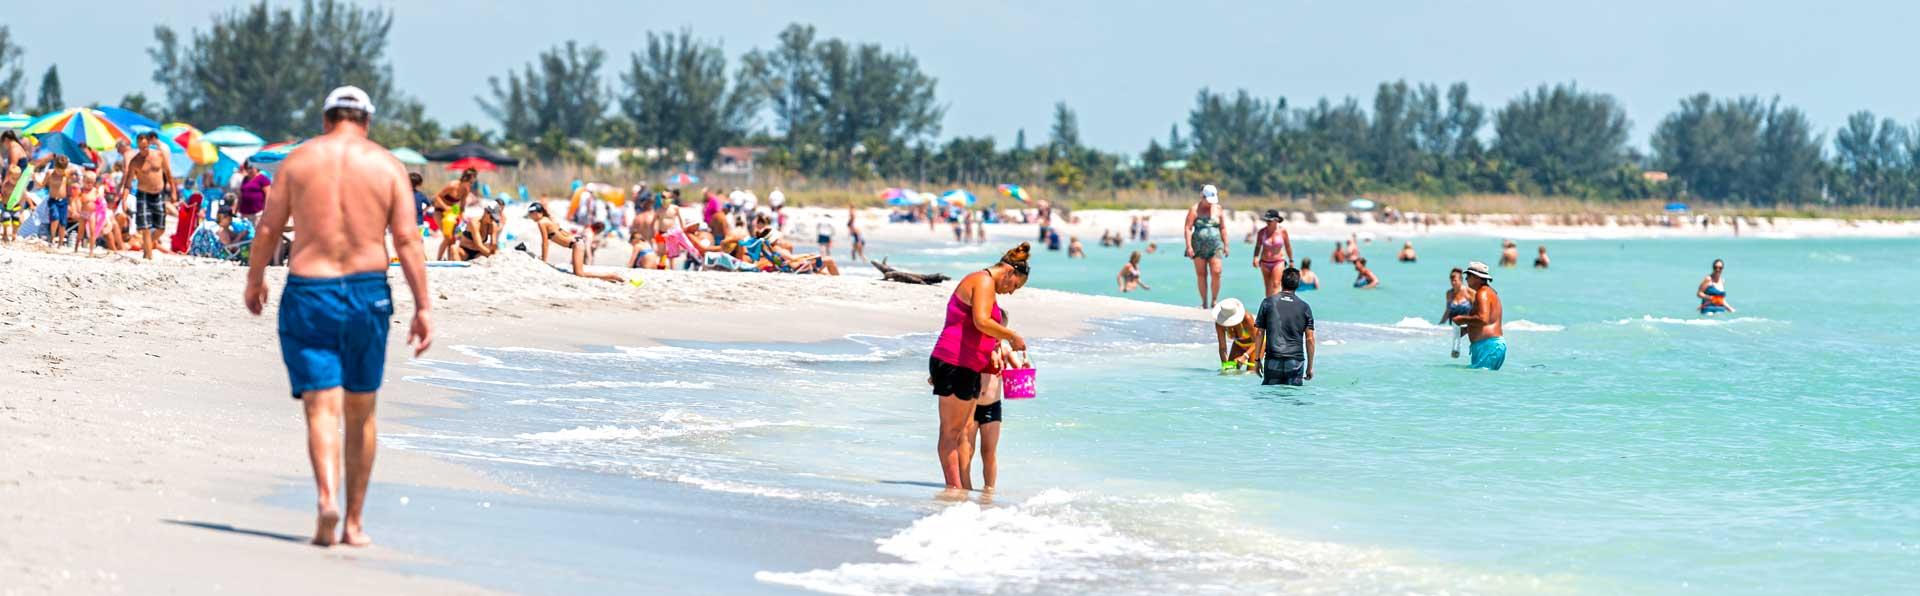 Floridas Nude & Clothing-Optional Guide